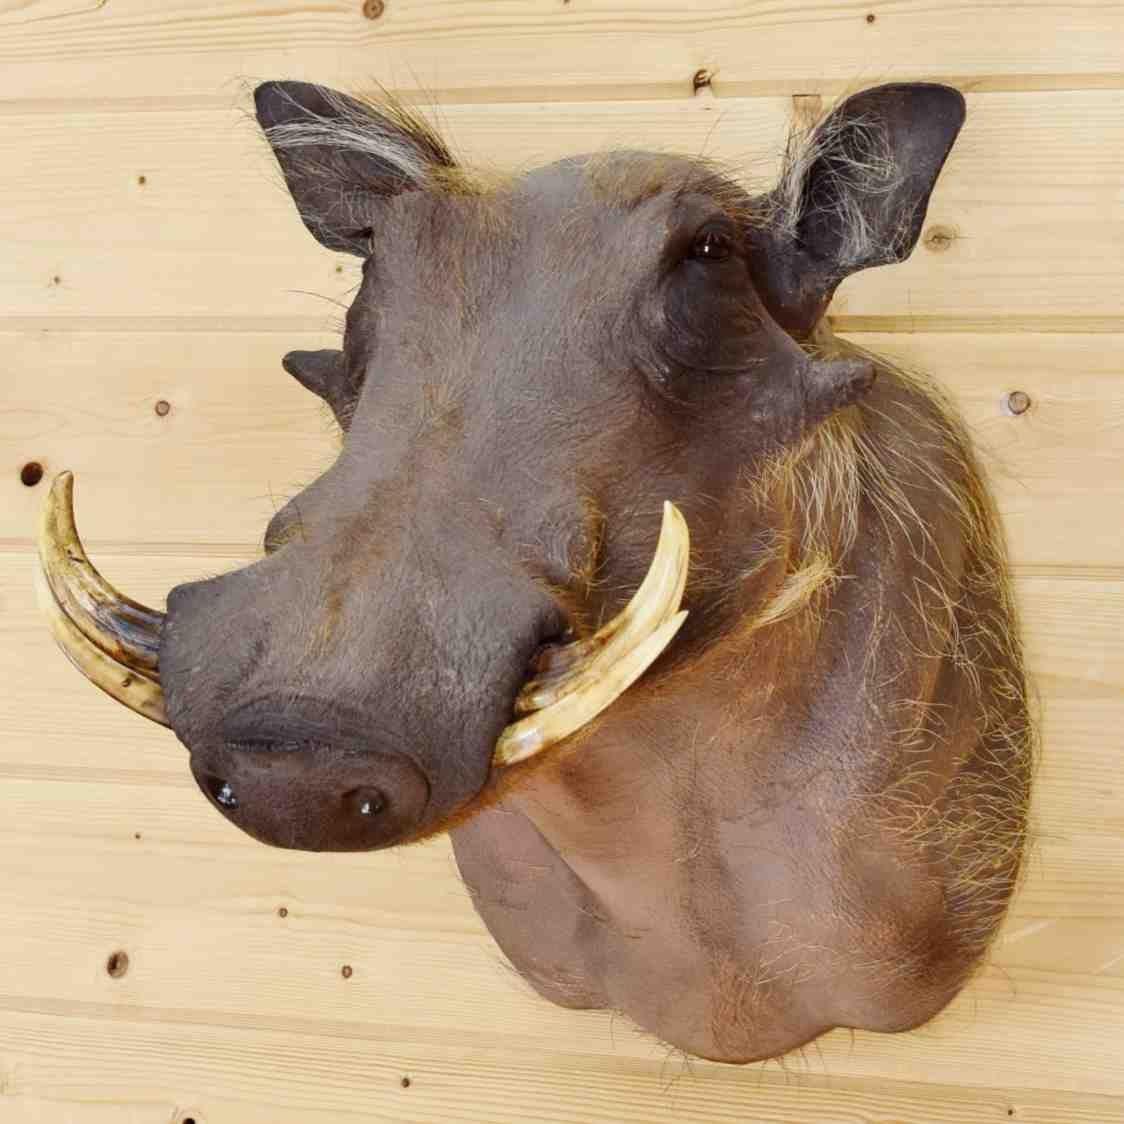 Shoulder Mount Big TusksAfrica Safari DecorHunting Lodge Huge Taxidermy African Wart Hog